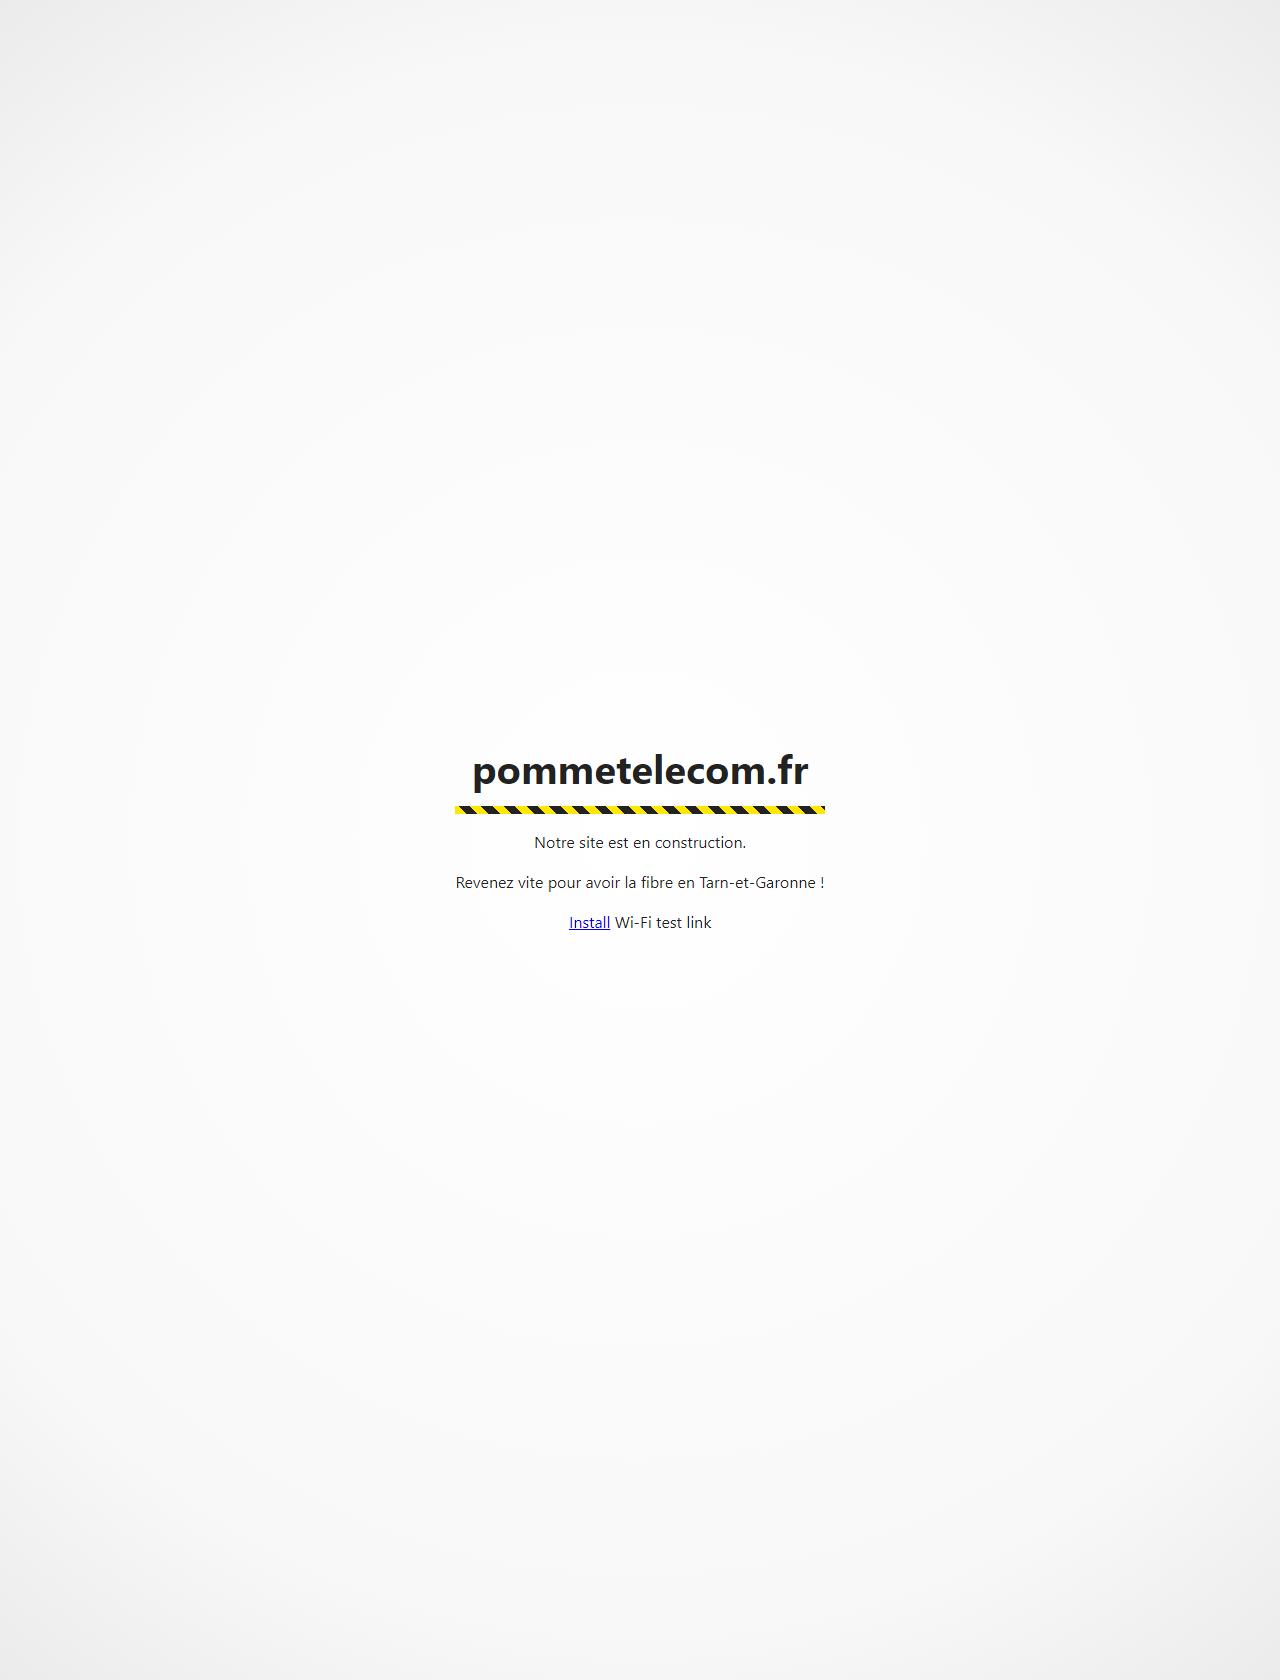 Screenshot Desktop - https://pommetelecom.fr/